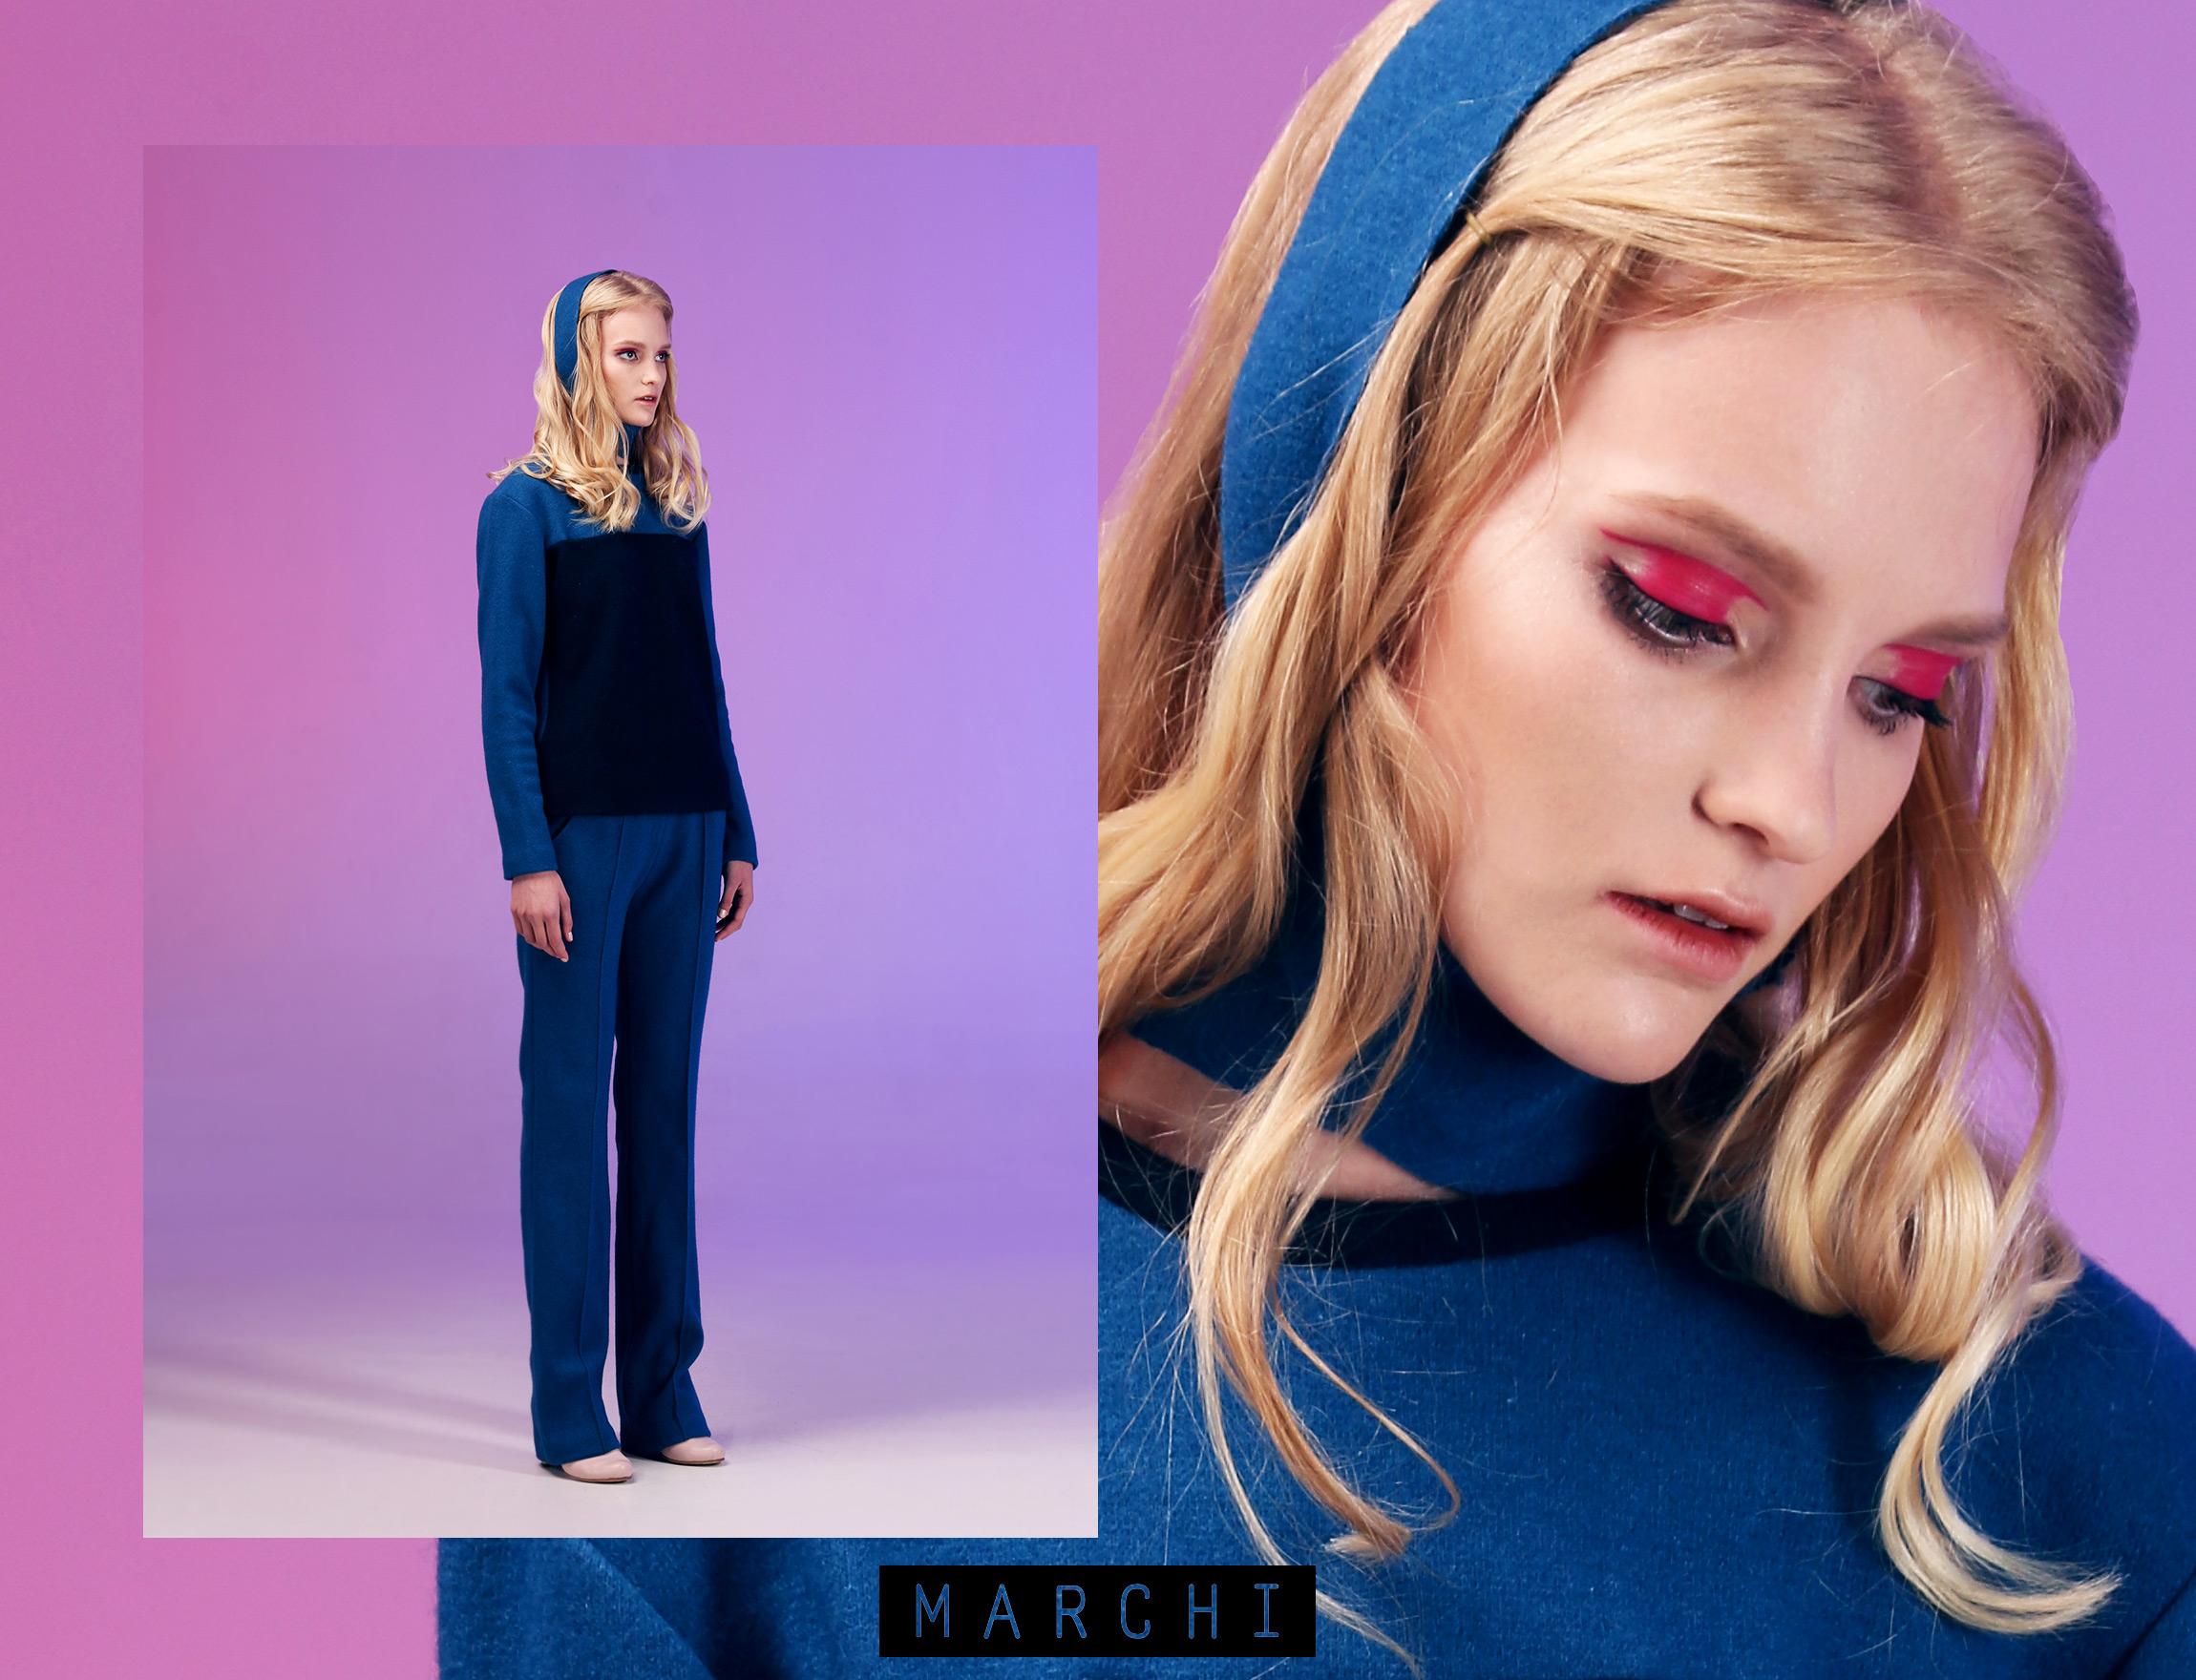 Курс на Восток: бренд MARCHI представил лукбук осенней коллекции-320x180